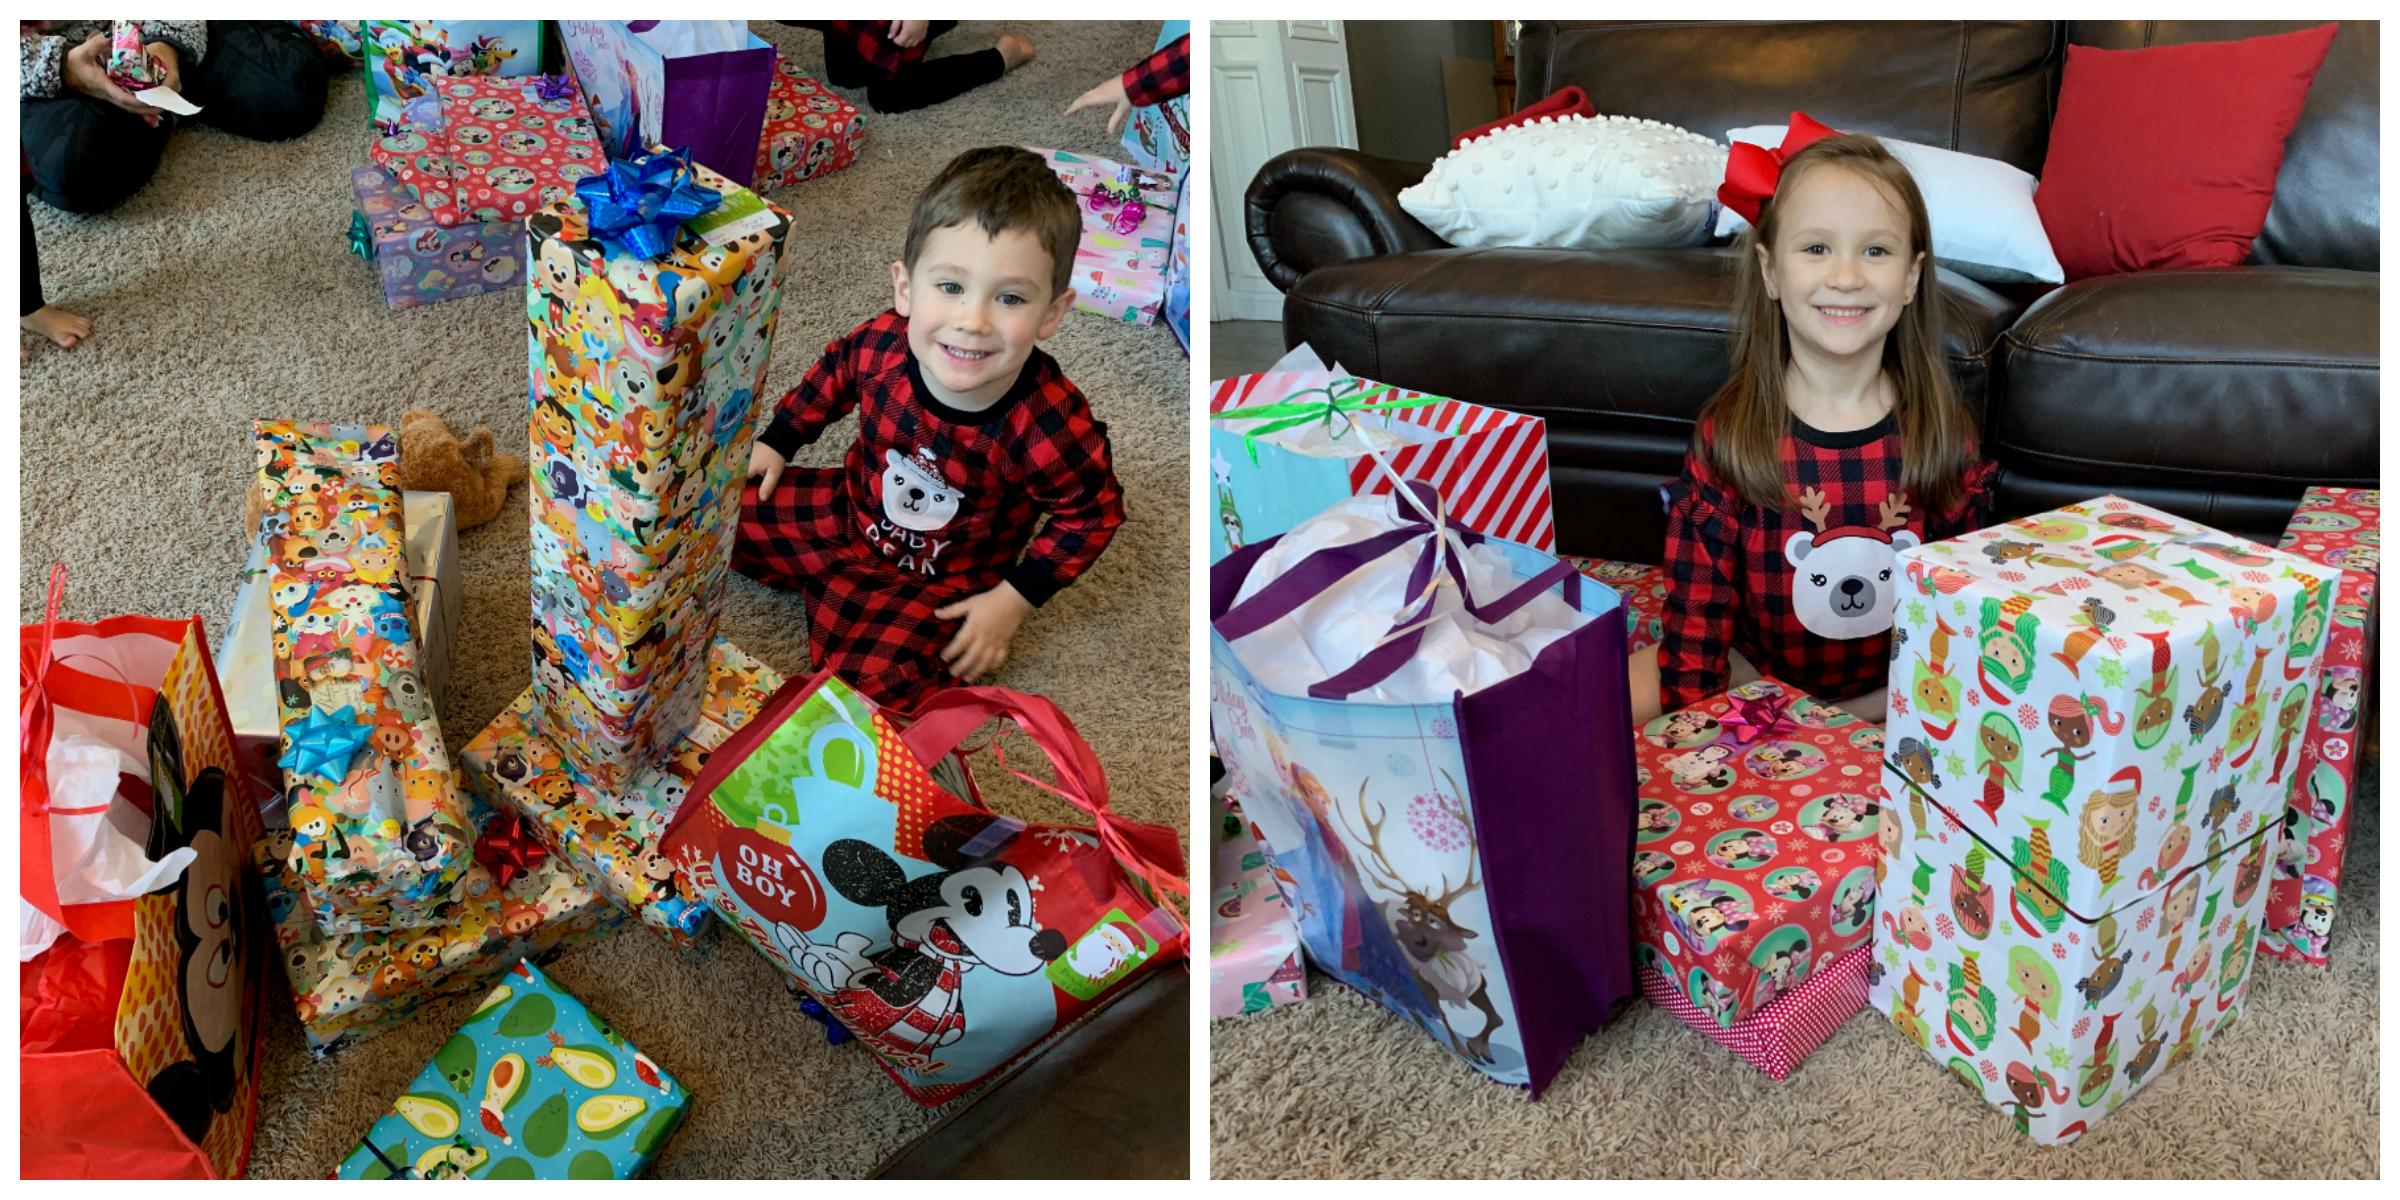 ChristmasDay-presents